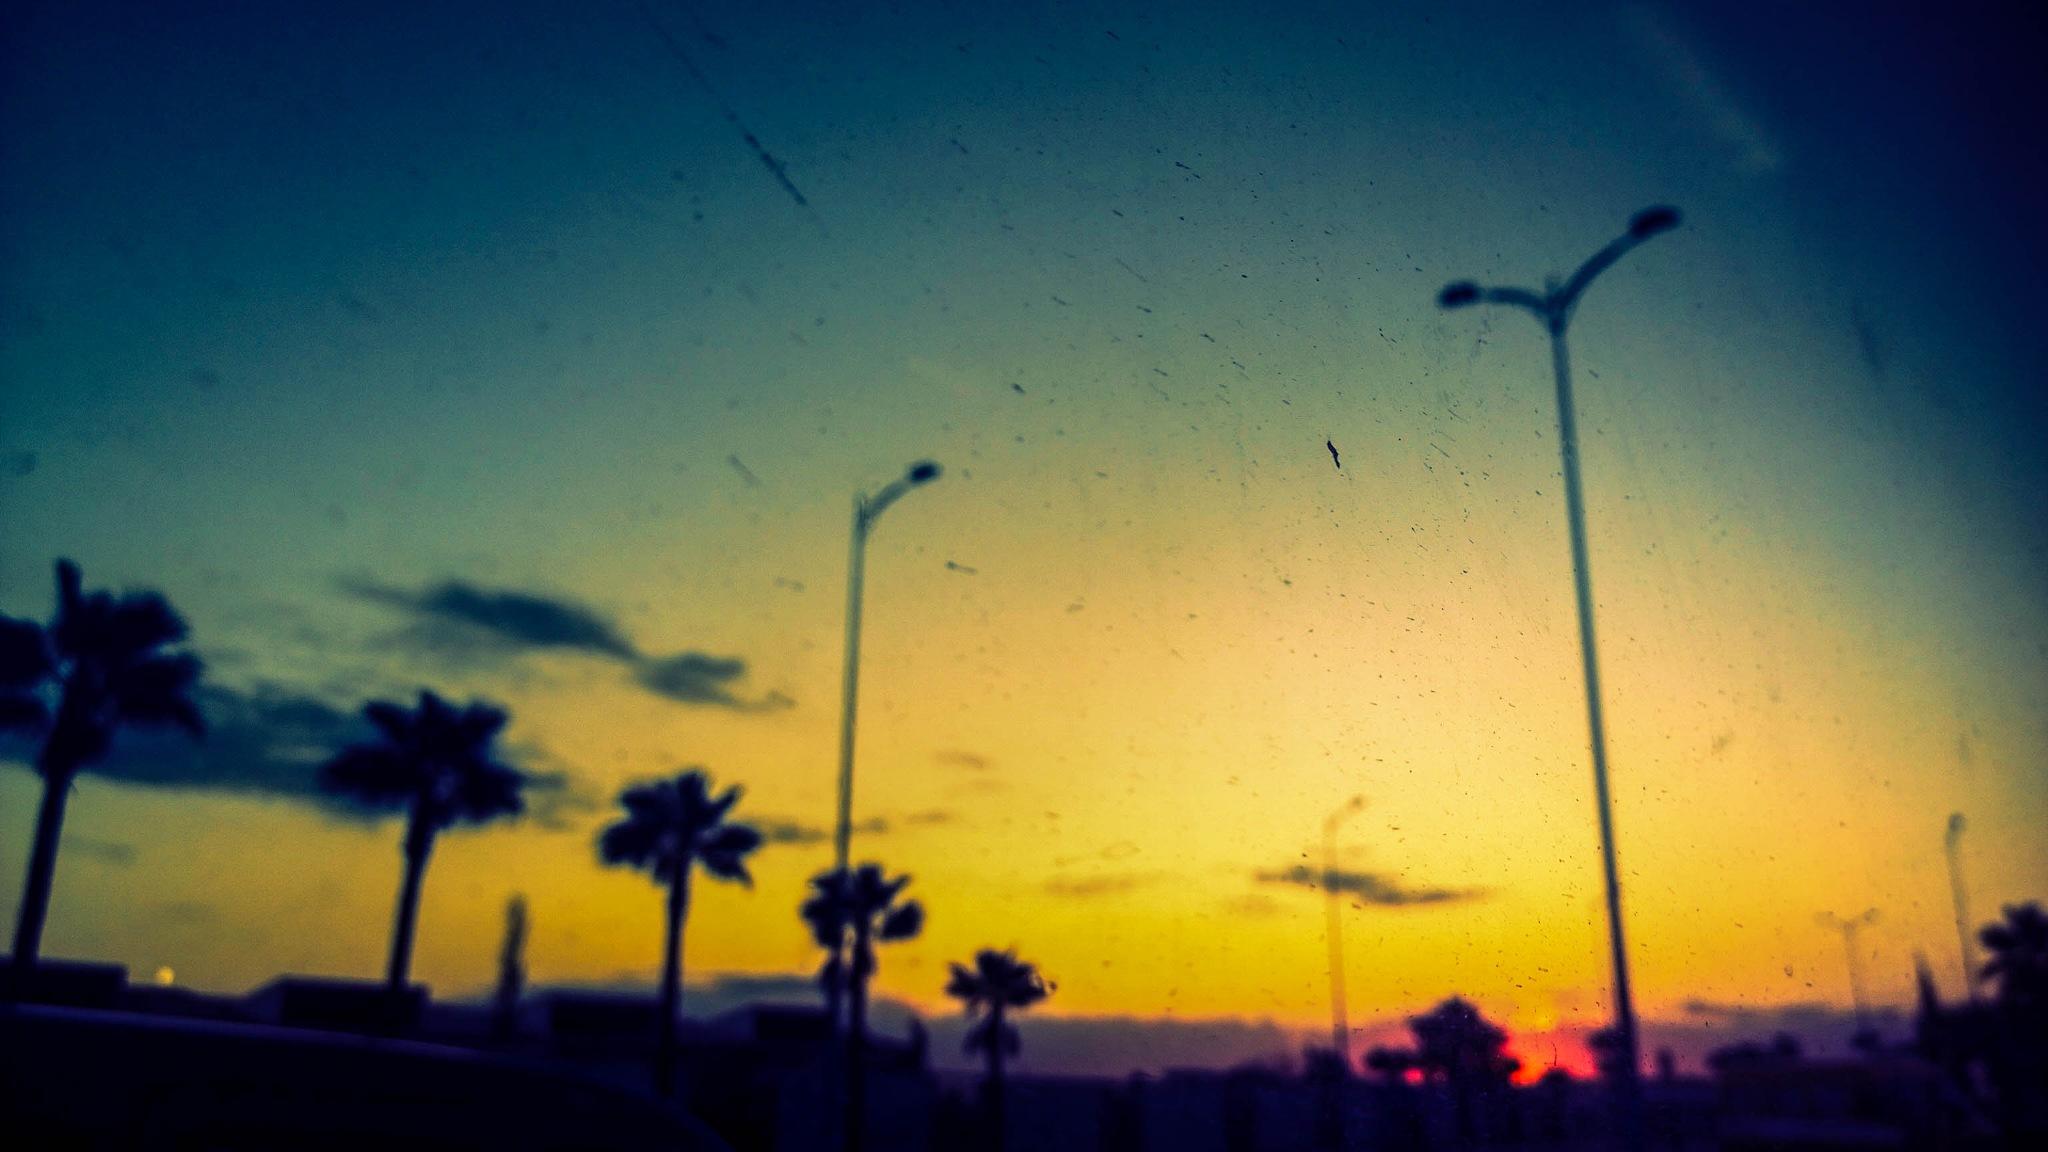 SUNSET by Bako Baki